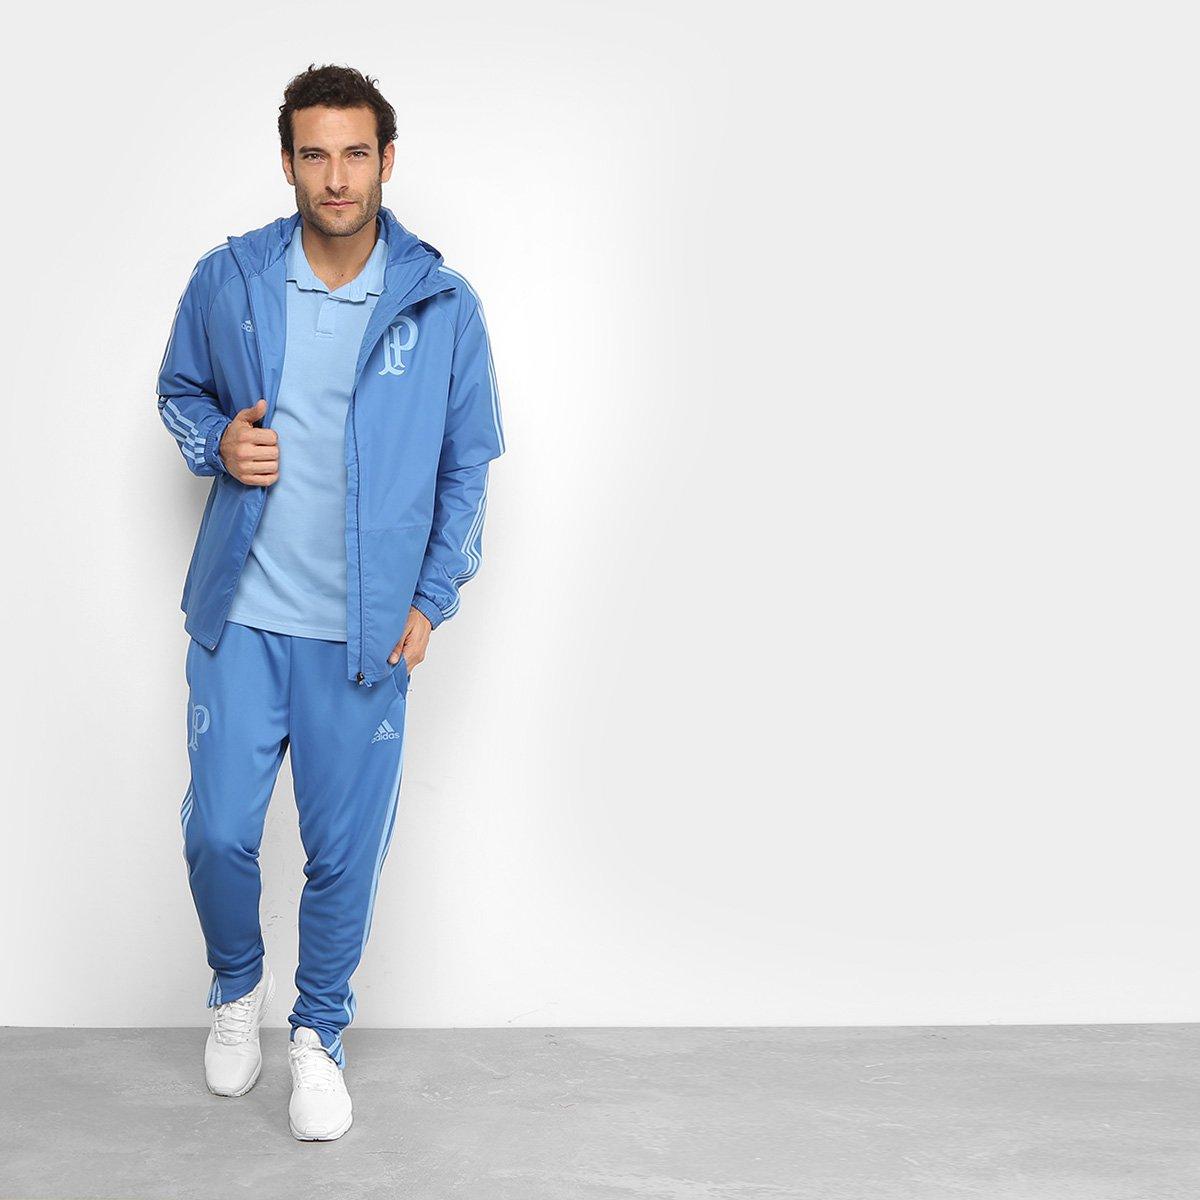 Jaqueta de Chuva Palmeiras Adidas Masculina - Compre Agora  31174634fc2eb